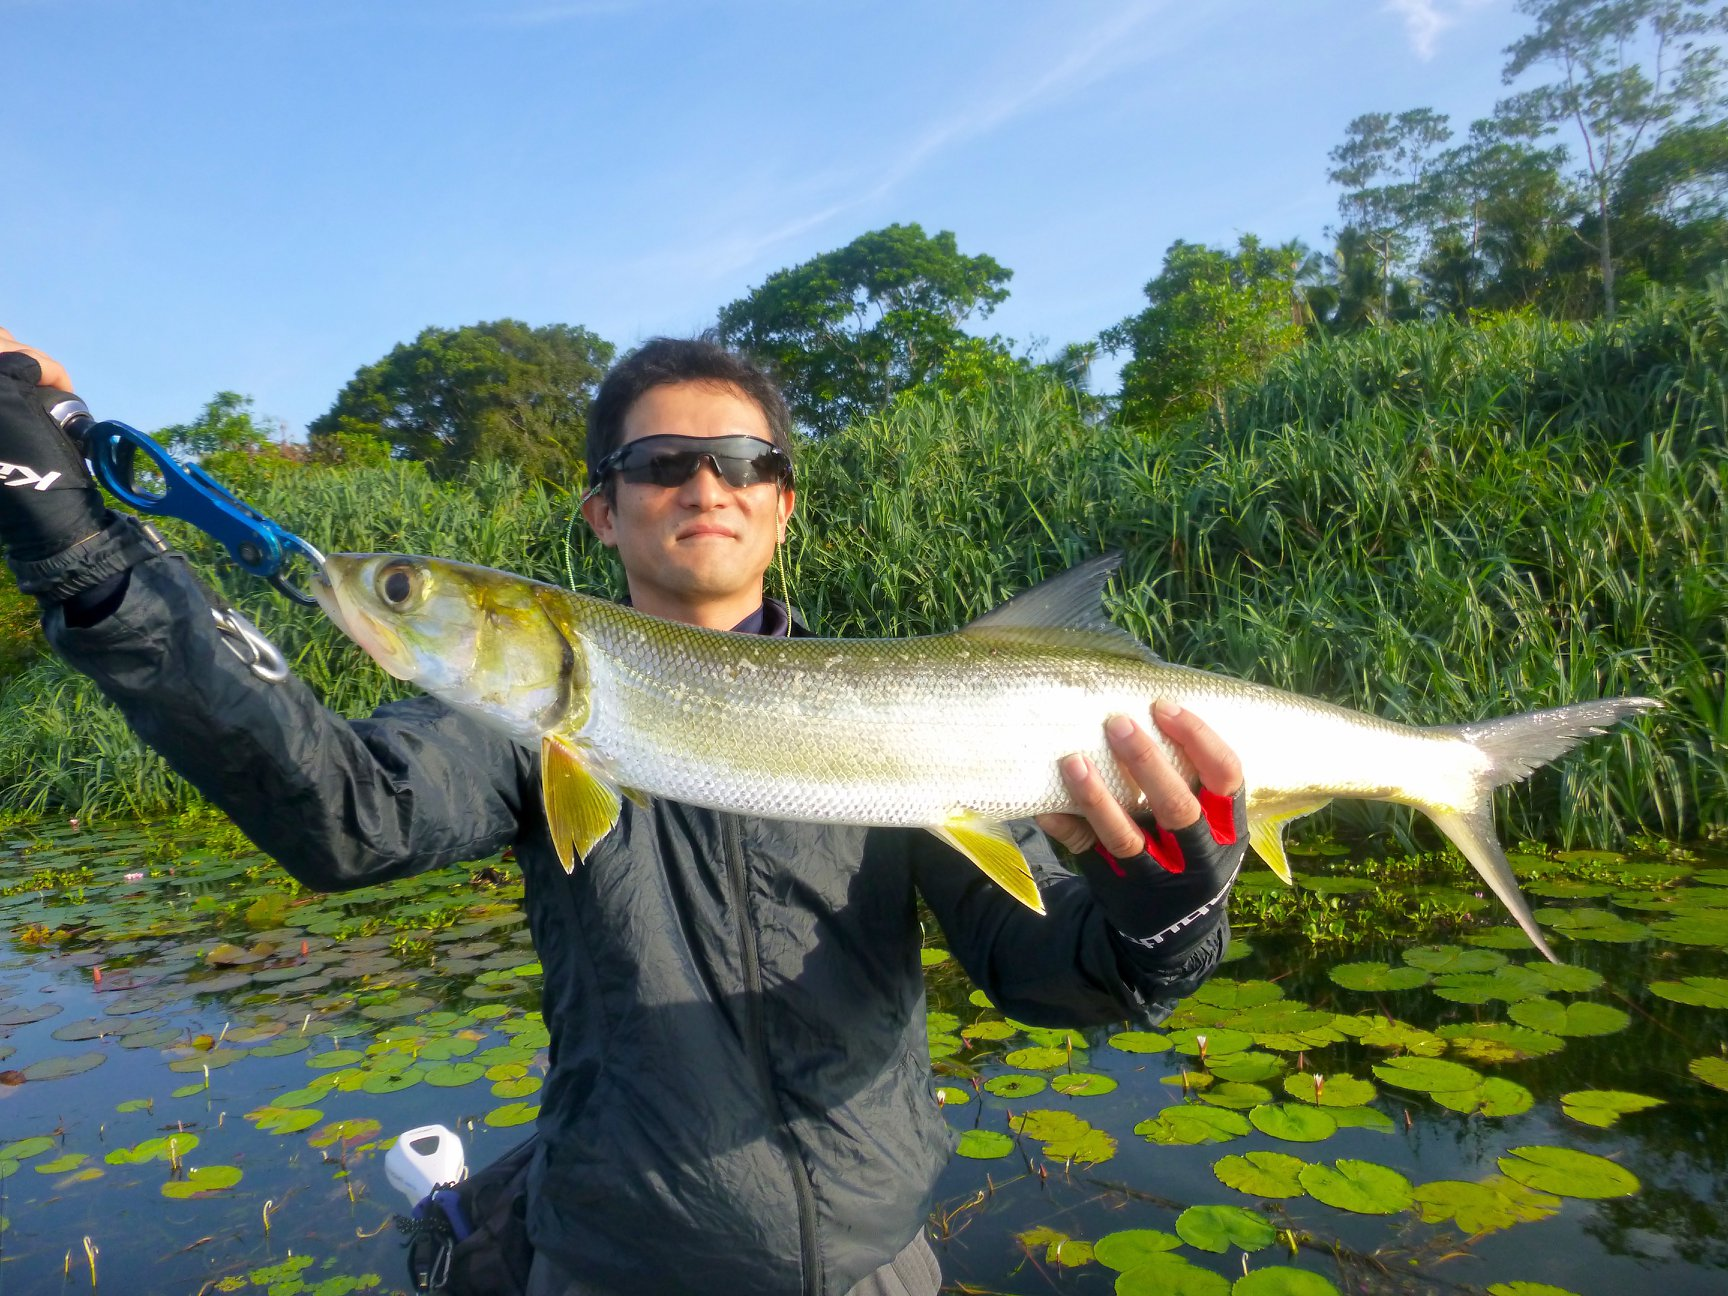 Casting lures in Bolgoda Lake Sri Lanka Ladyfish.jpg